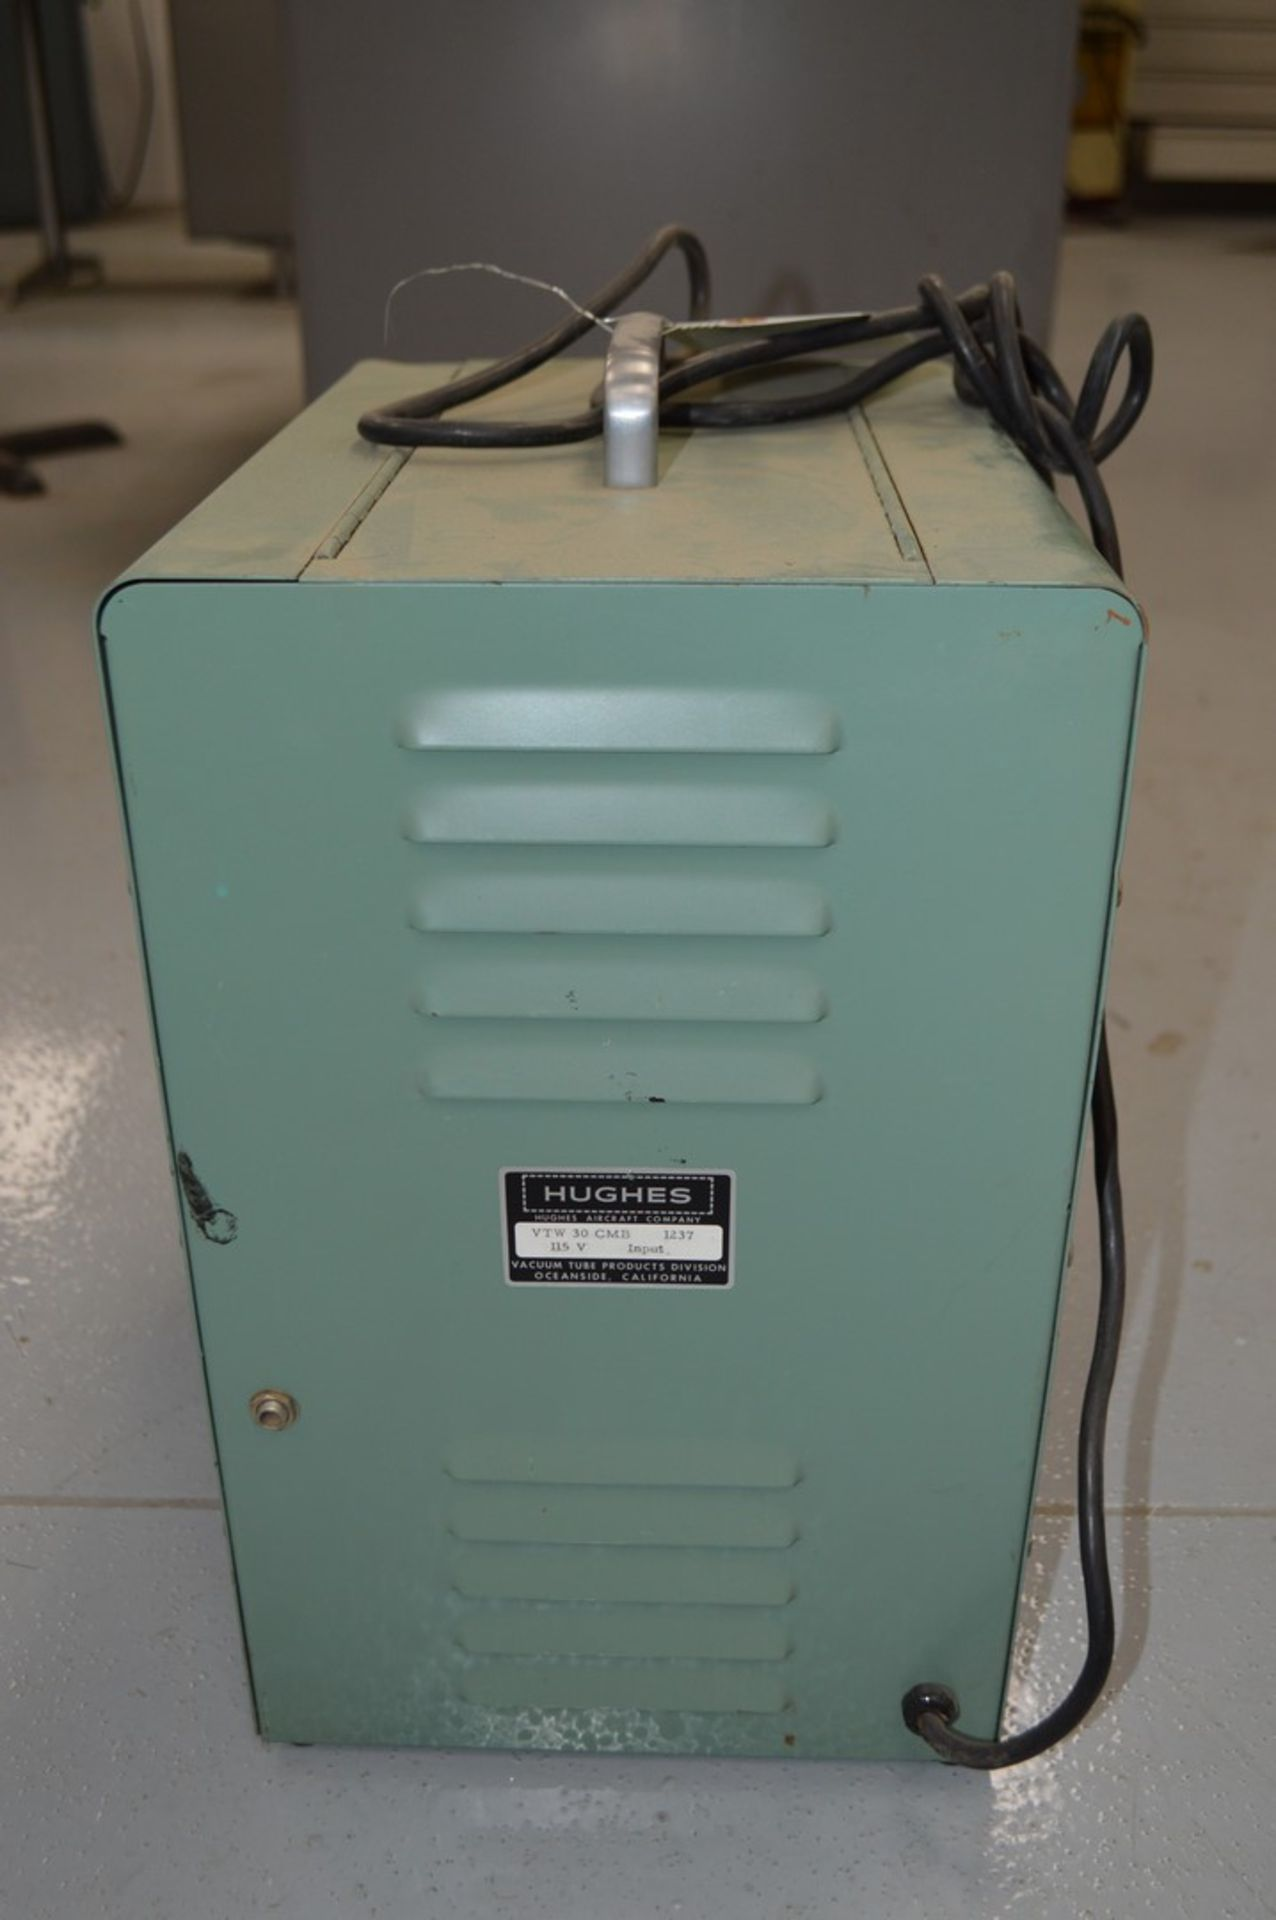 Hughes Model VTW-30C-MB Capacitance discharge spot welder - Image 3 of 3